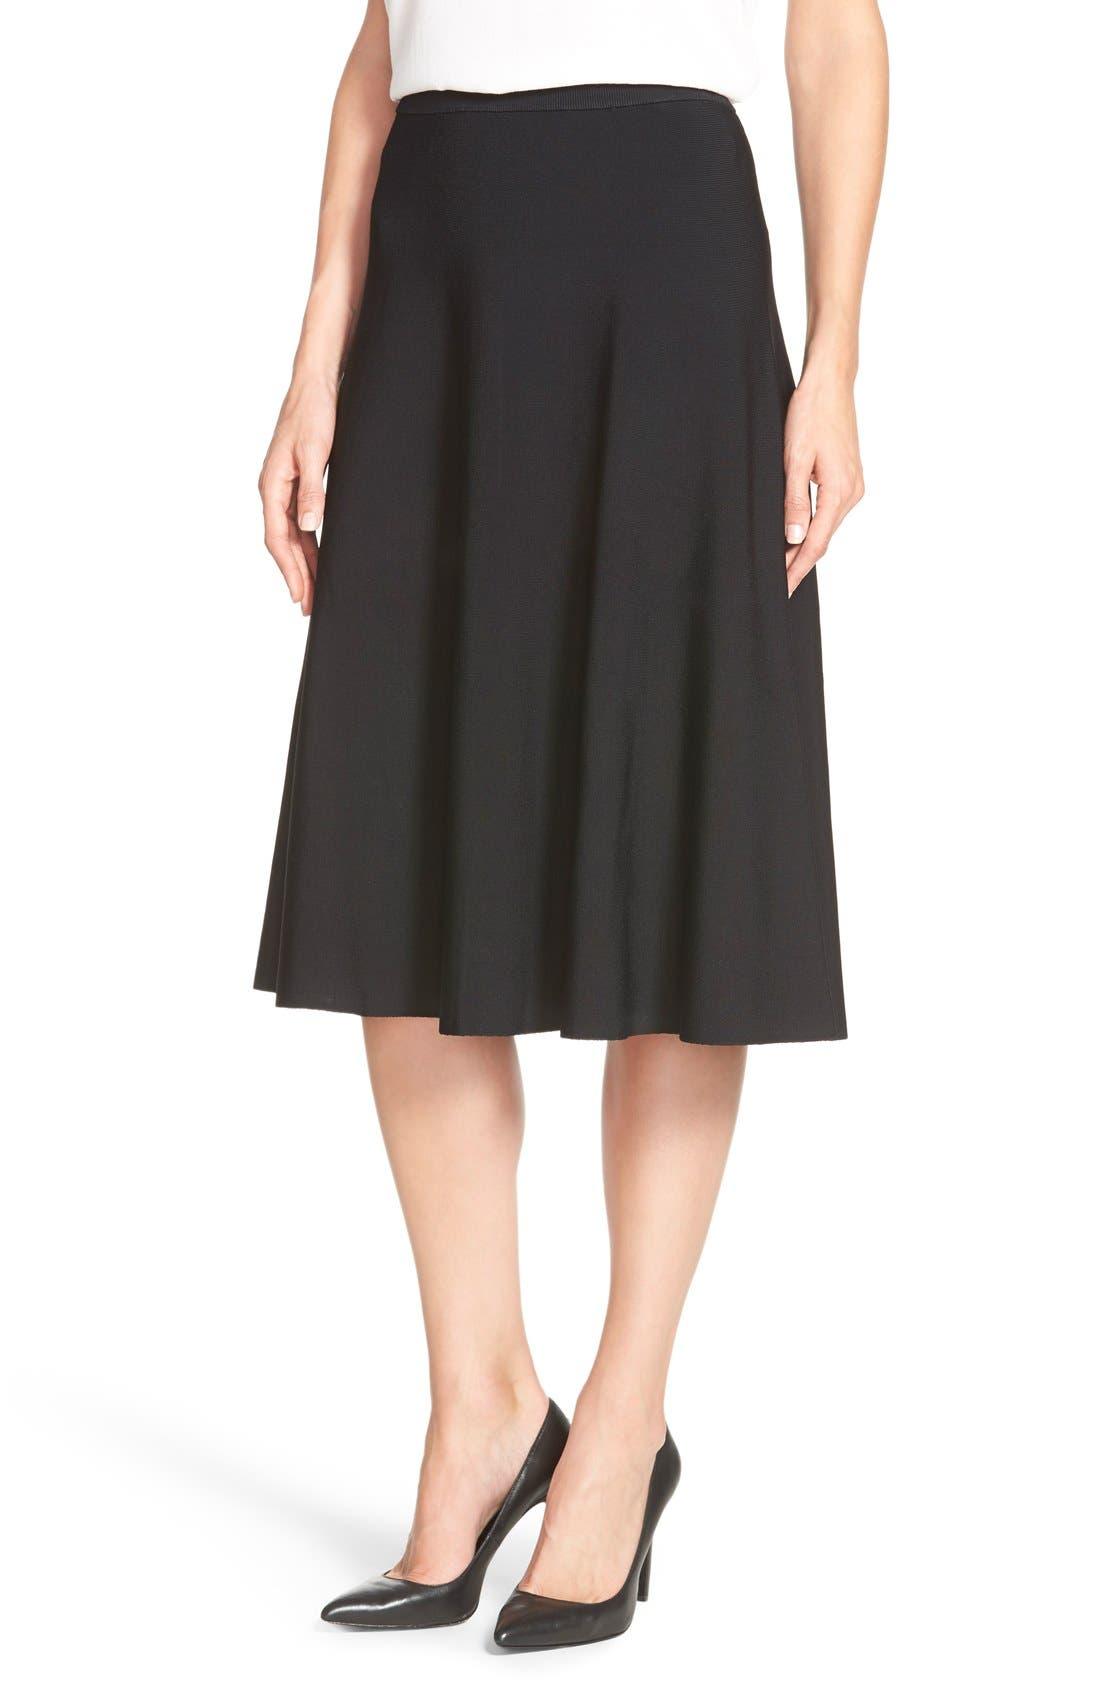 Alternate Image 1 Selected - Halogen® Flare Midi Skirt (Regular & Petite)